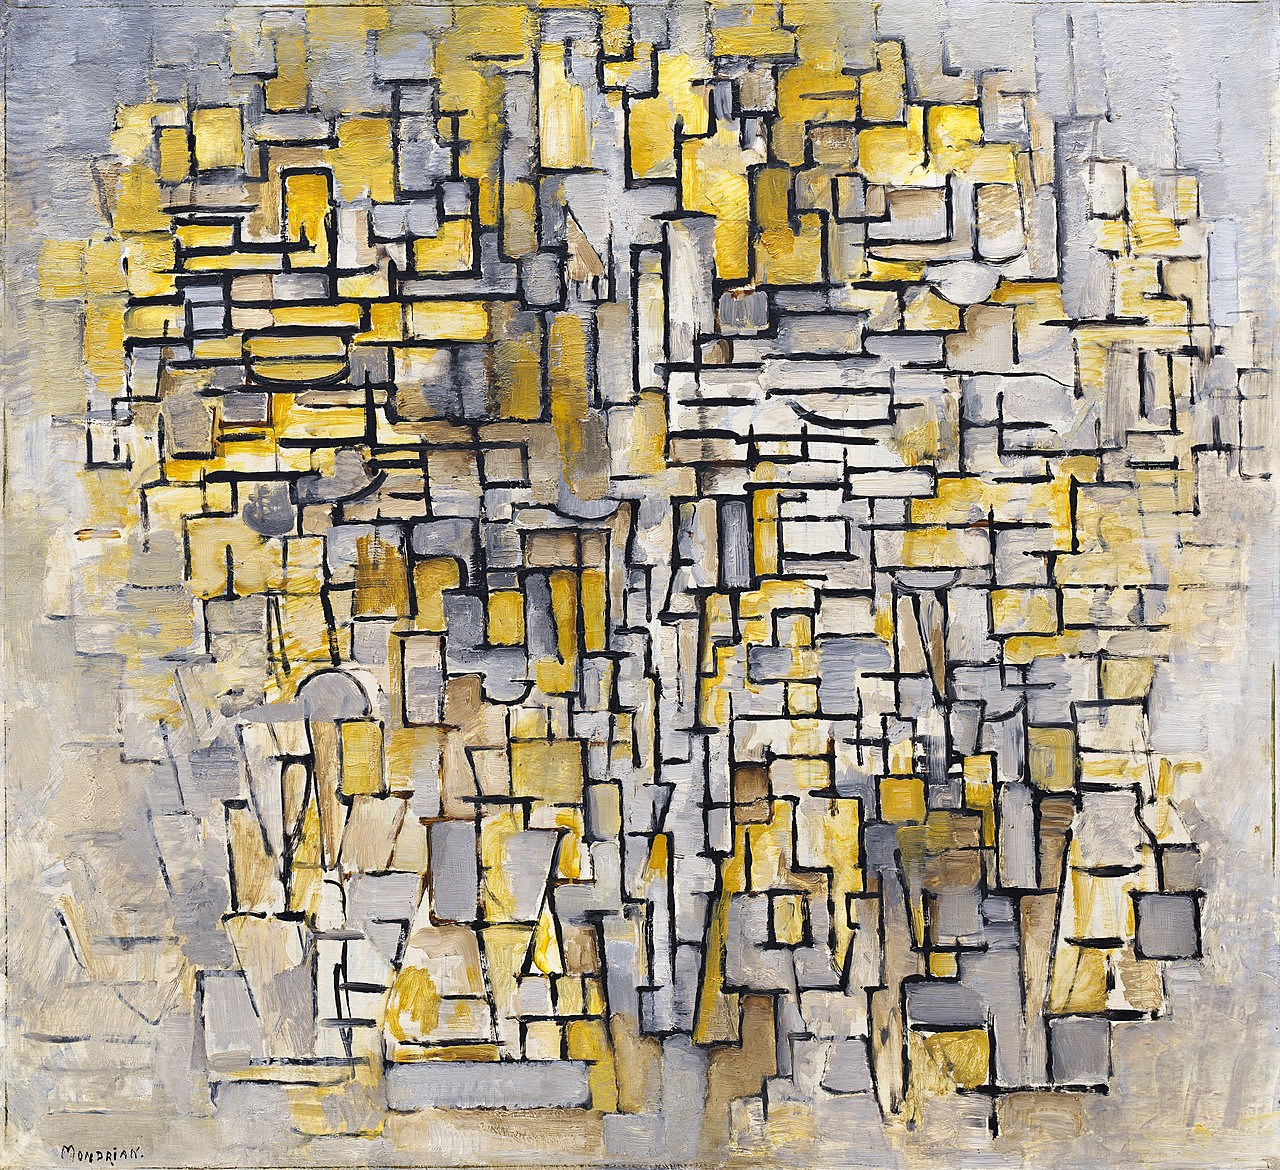 Piet Mondrian's Tableau No. 2/Composition No. VII (1913) | Source: guggenheim.org